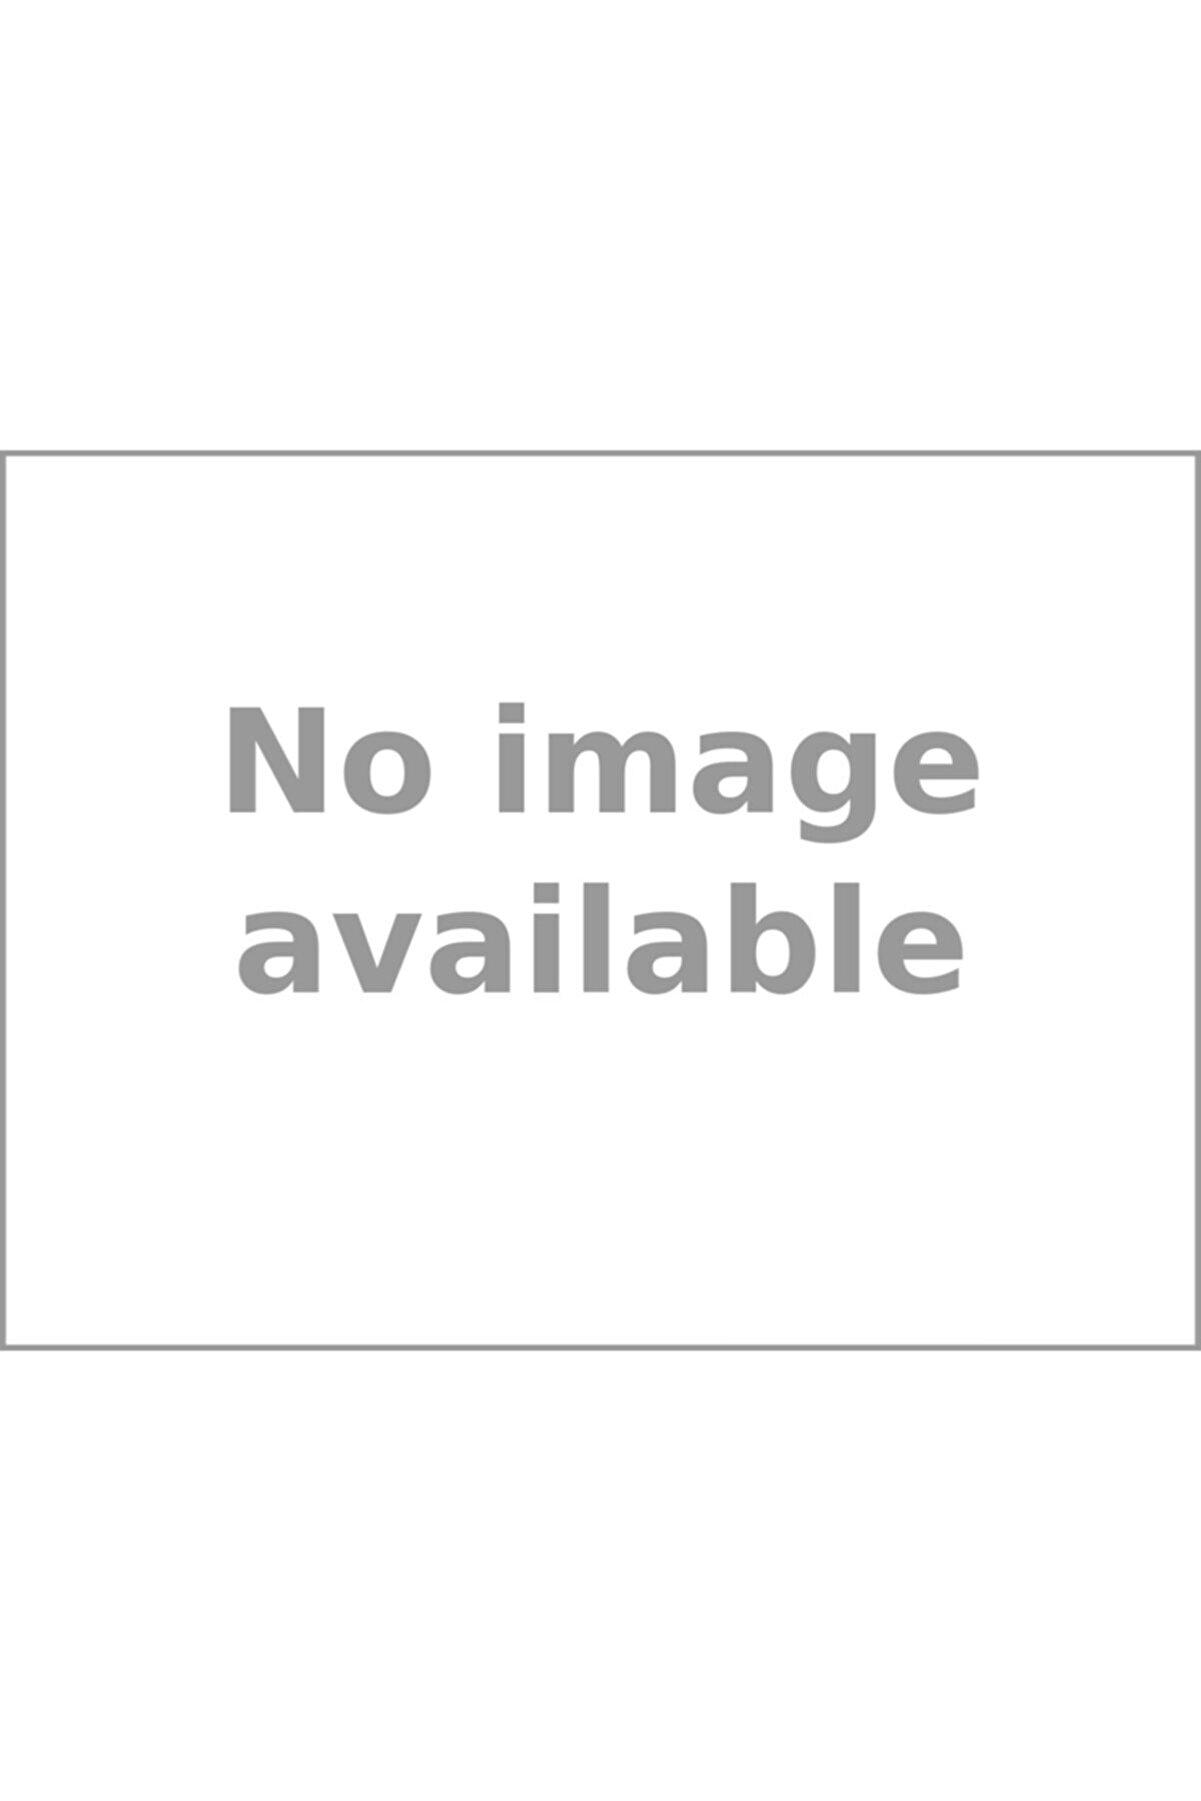 Mac Orta Boy Kompakt - Pro Palette Medium Compact 773602391172